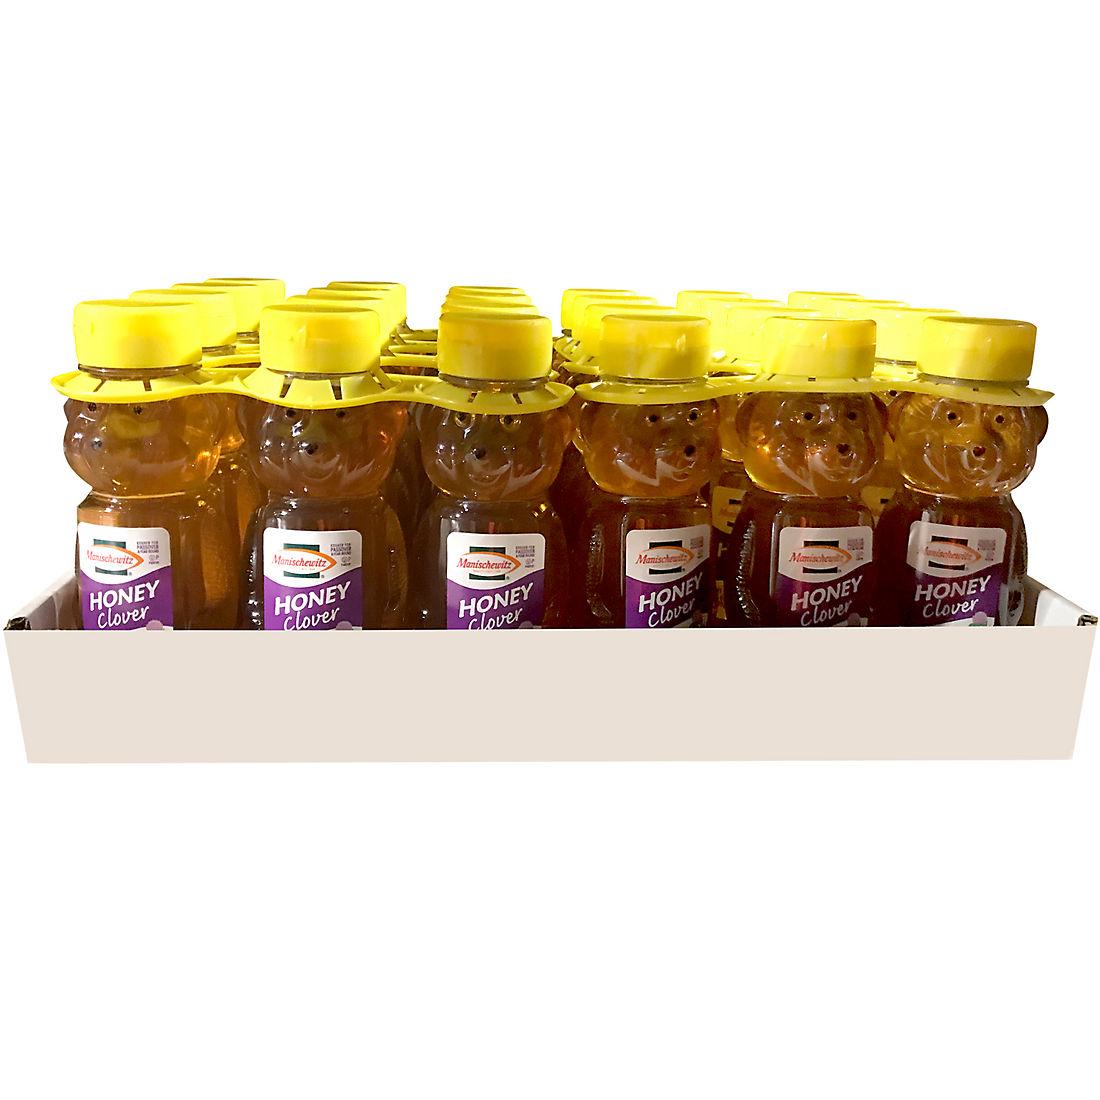 Manischewitz Clover Honey Bear, 3 pk /12 oz